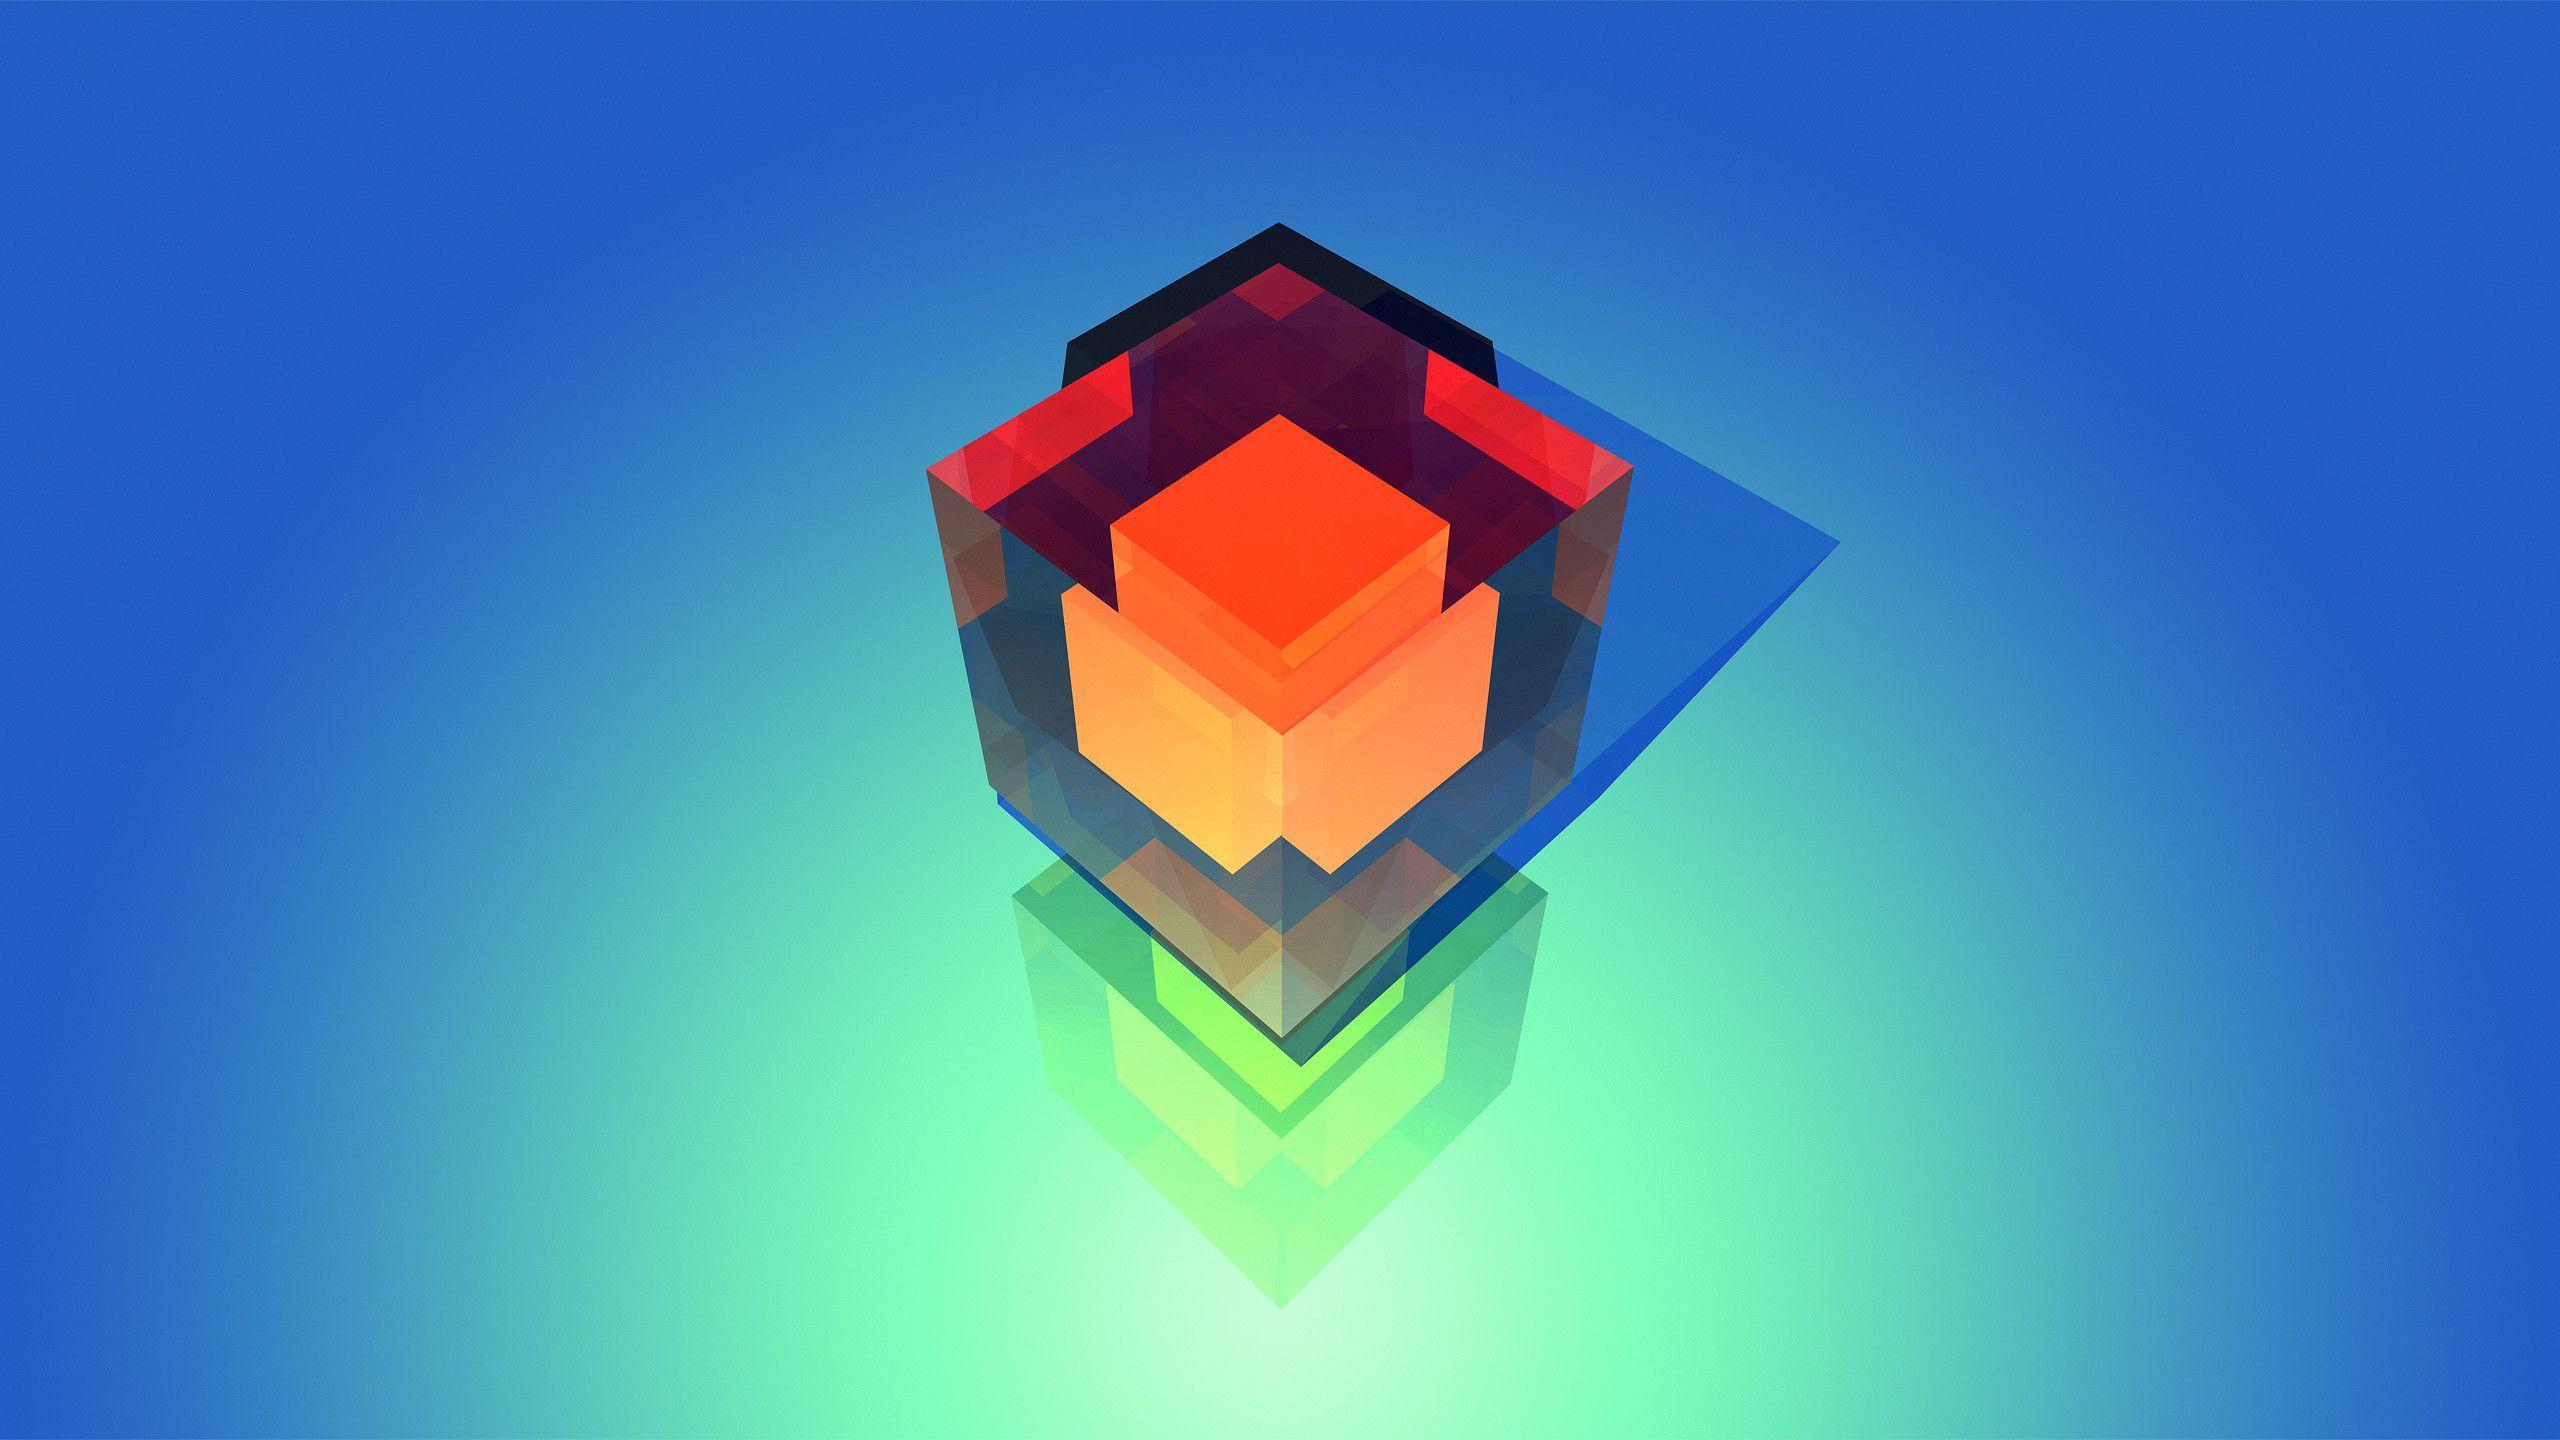 Fragon Justin Maller 4K Desktop Wallpapers - Top Free Fragon